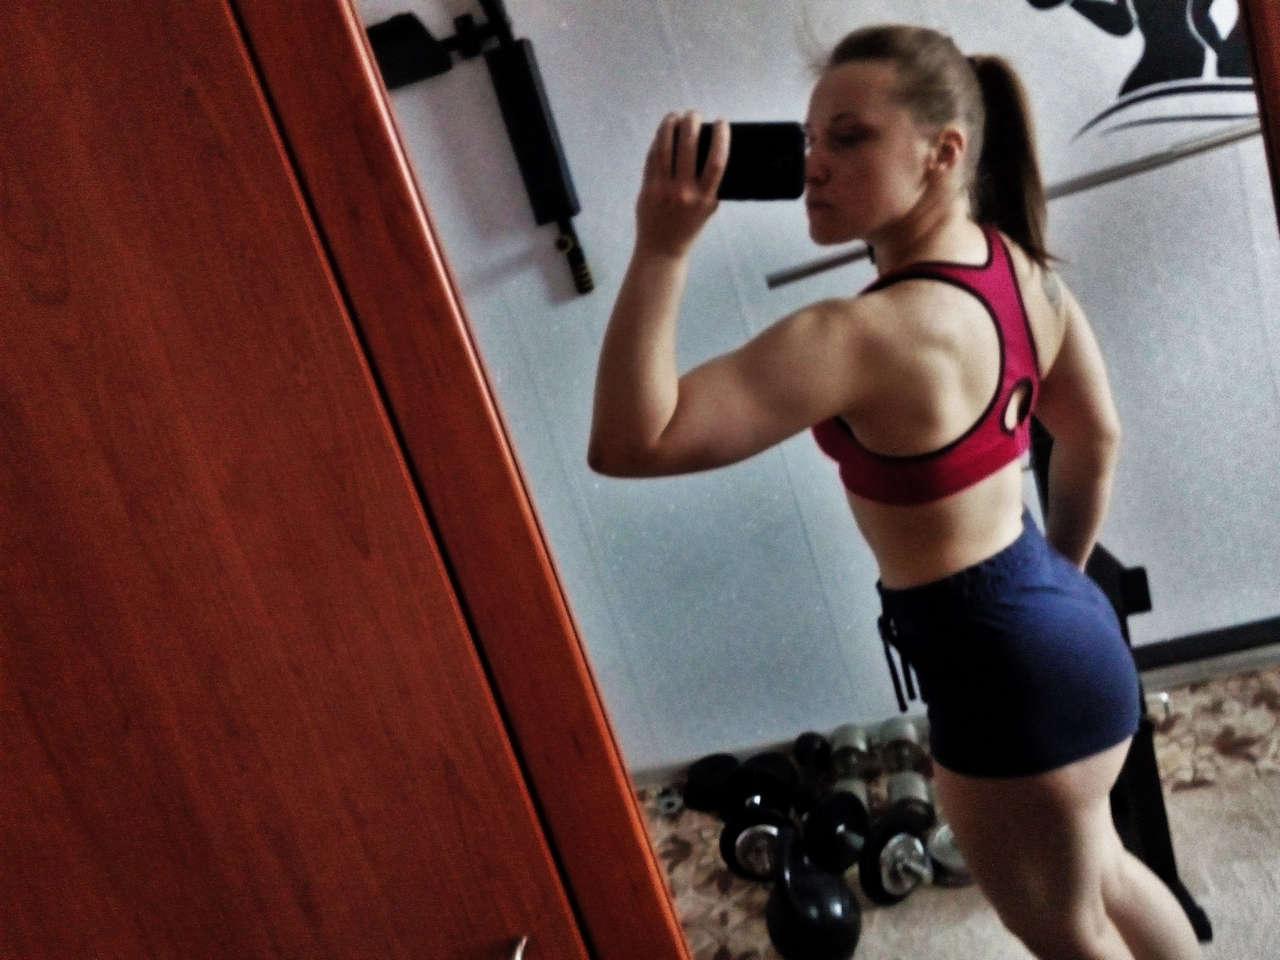 Alevtina Kormichina Muscles